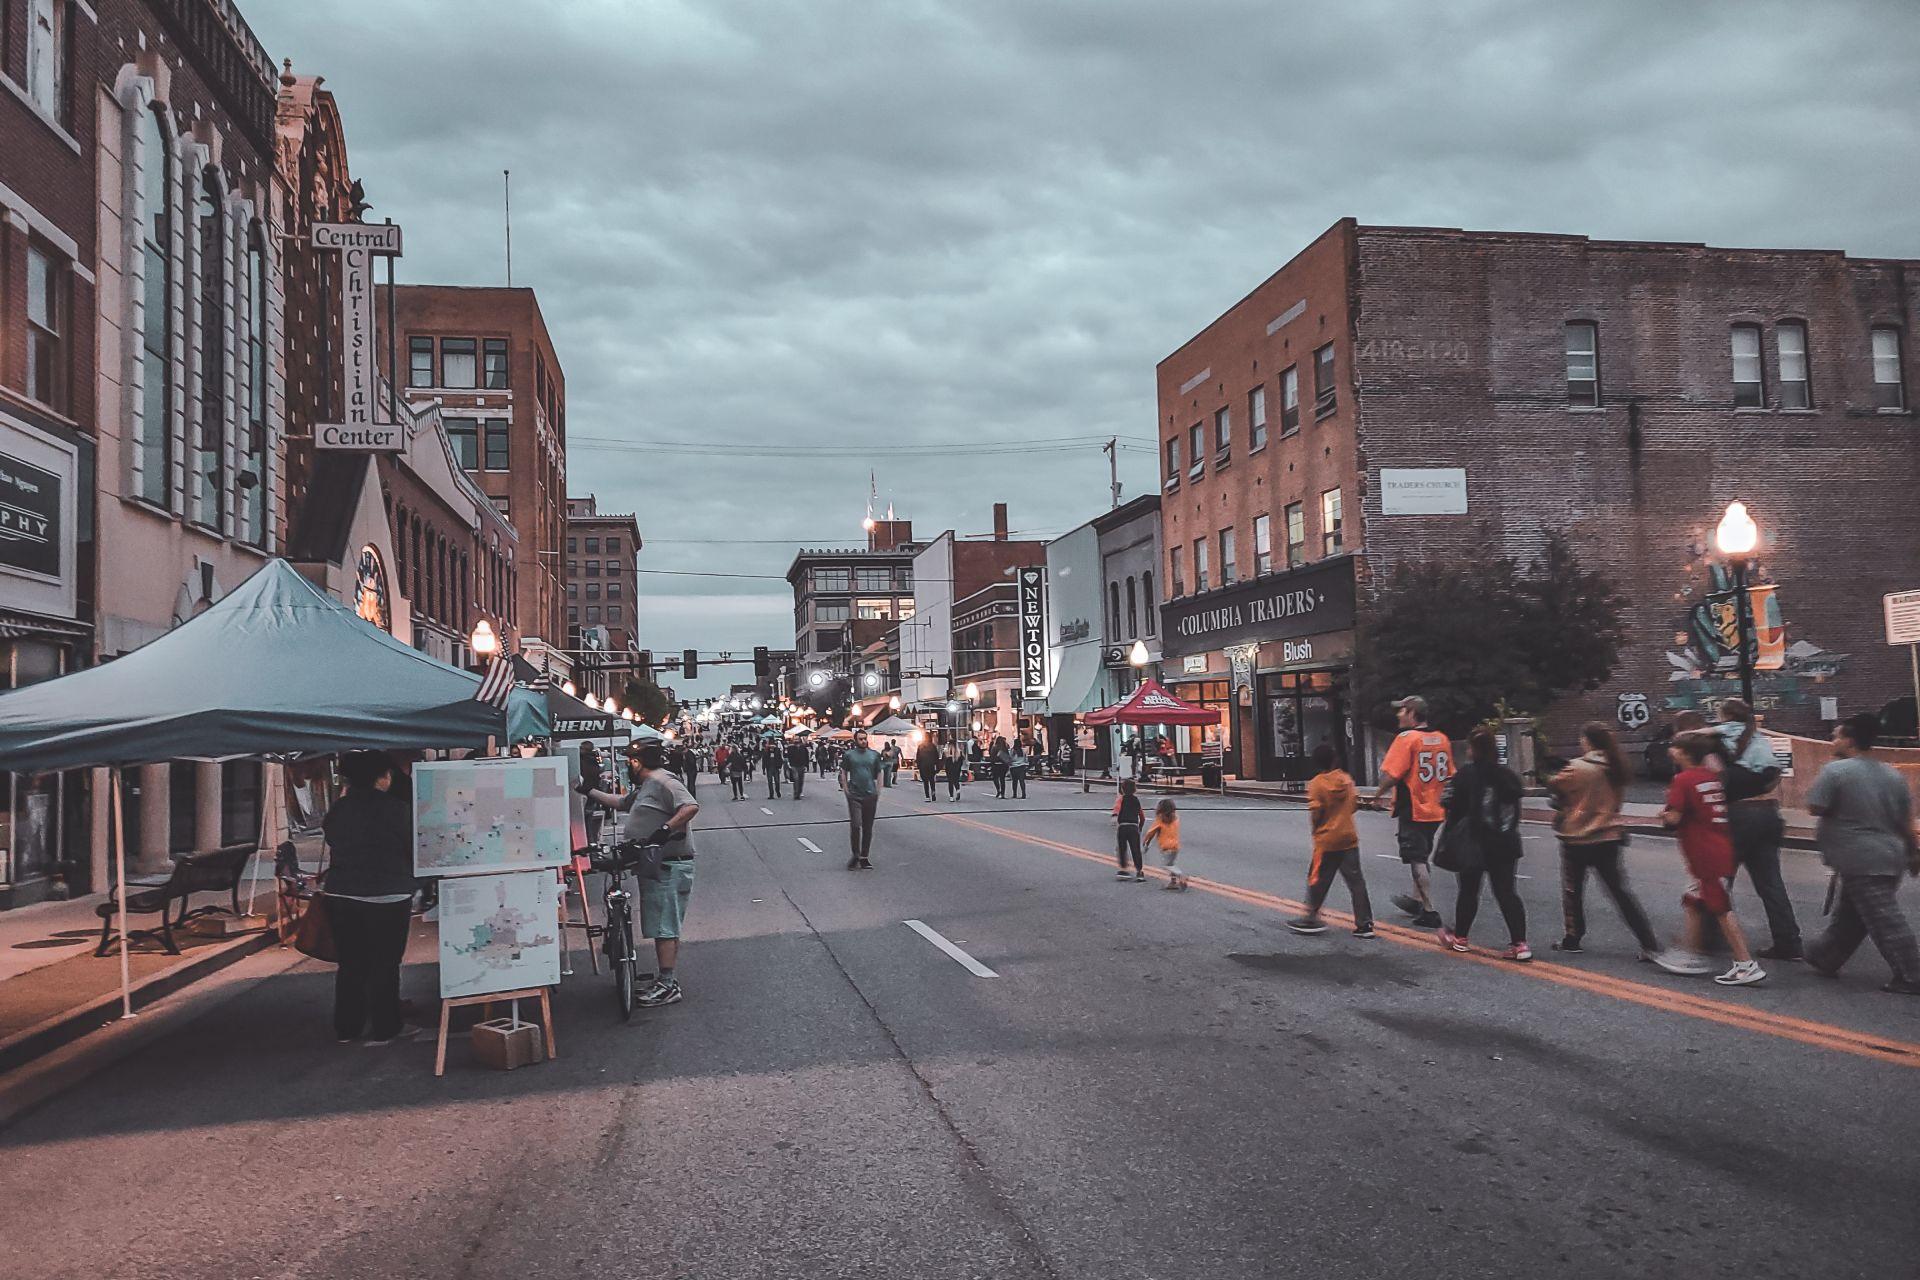 Third Thursday comes back to Joplin. 11